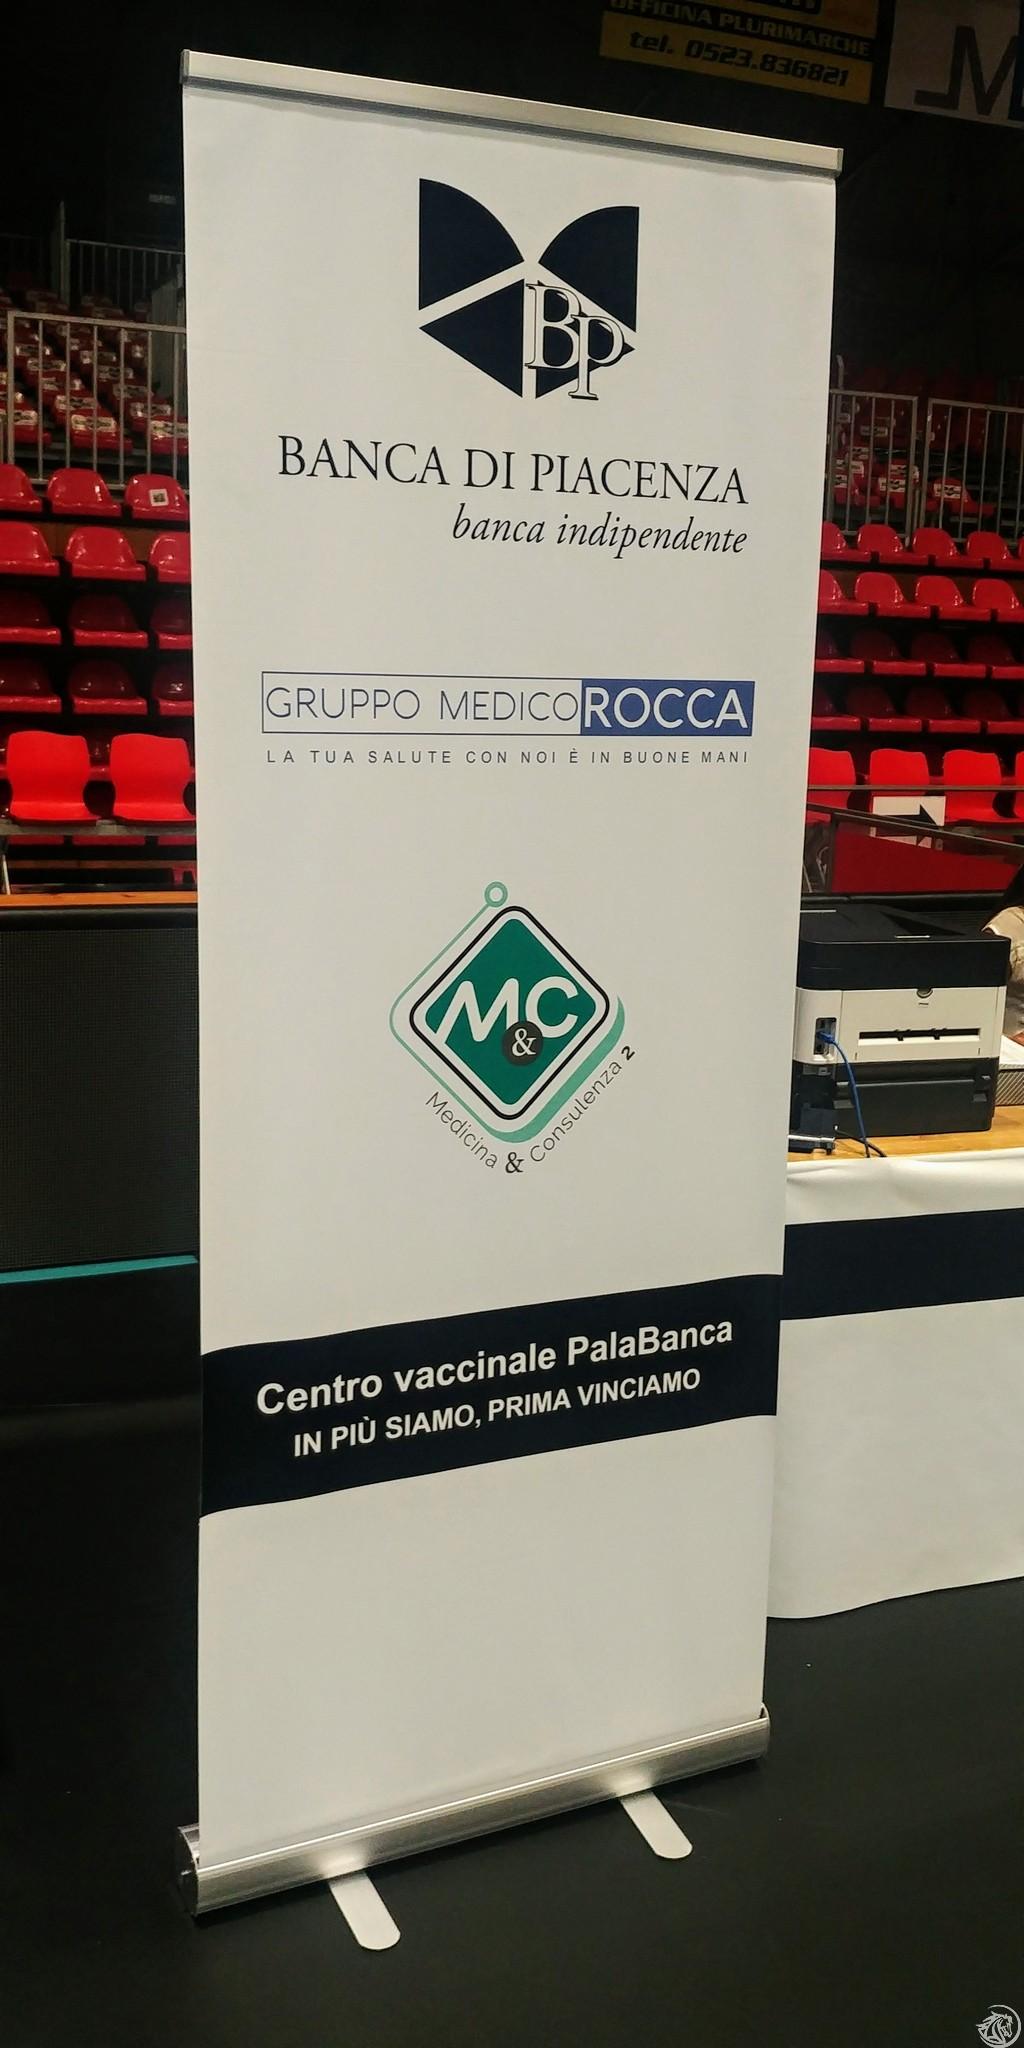 Centro-vaccinazioni-Palabanca-Banca-Piacenza_3